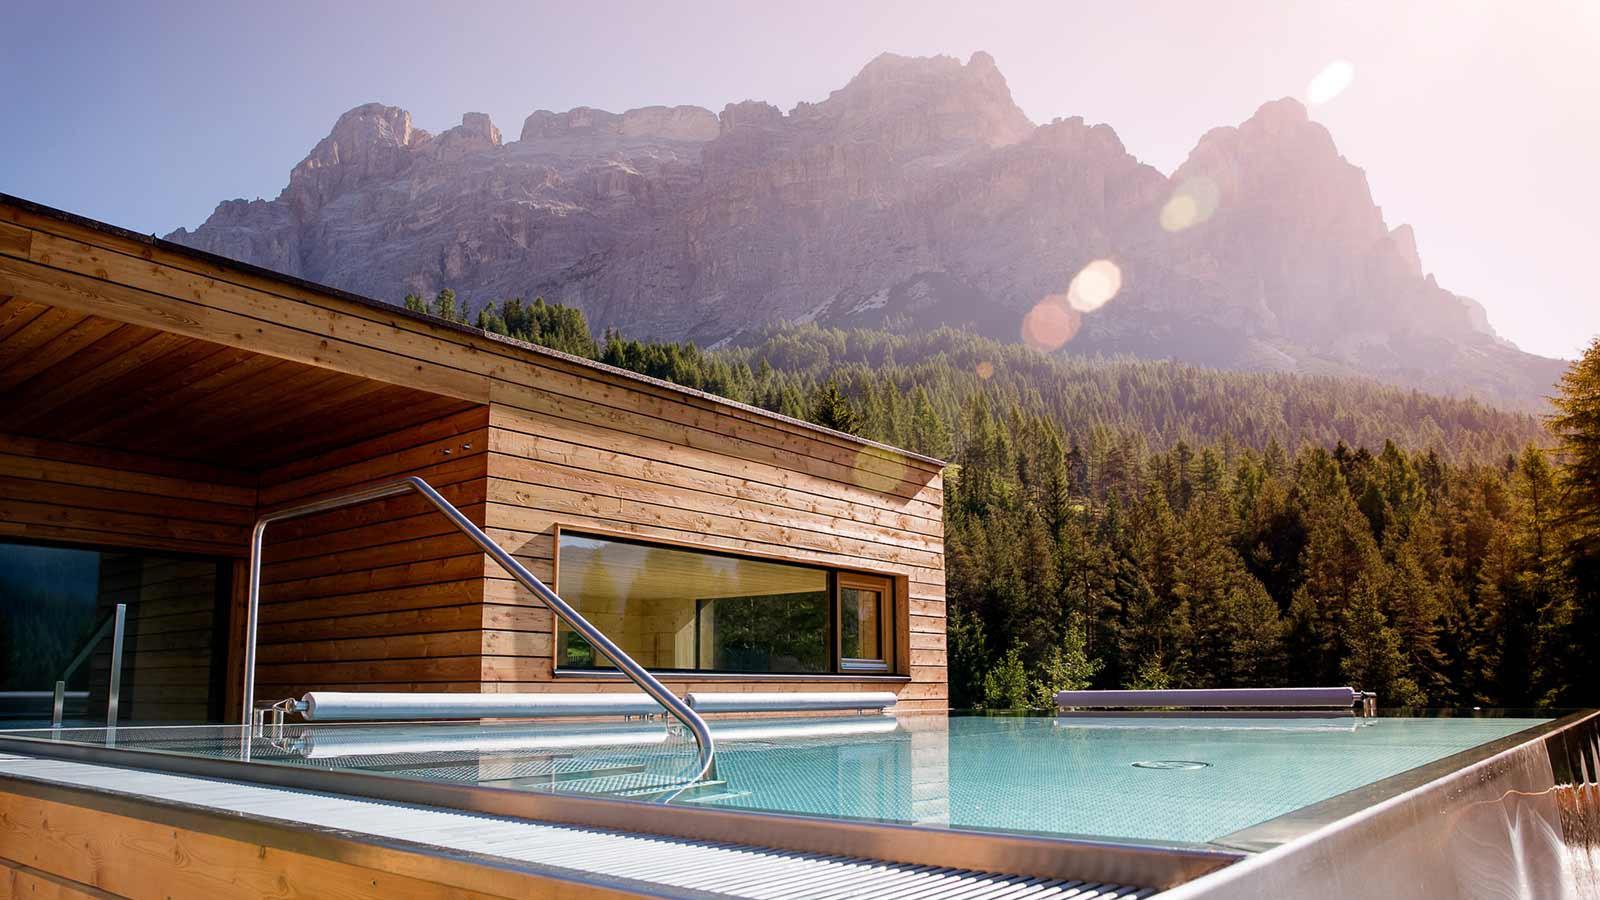 Hotel Gran Paradiso - Exerior pool